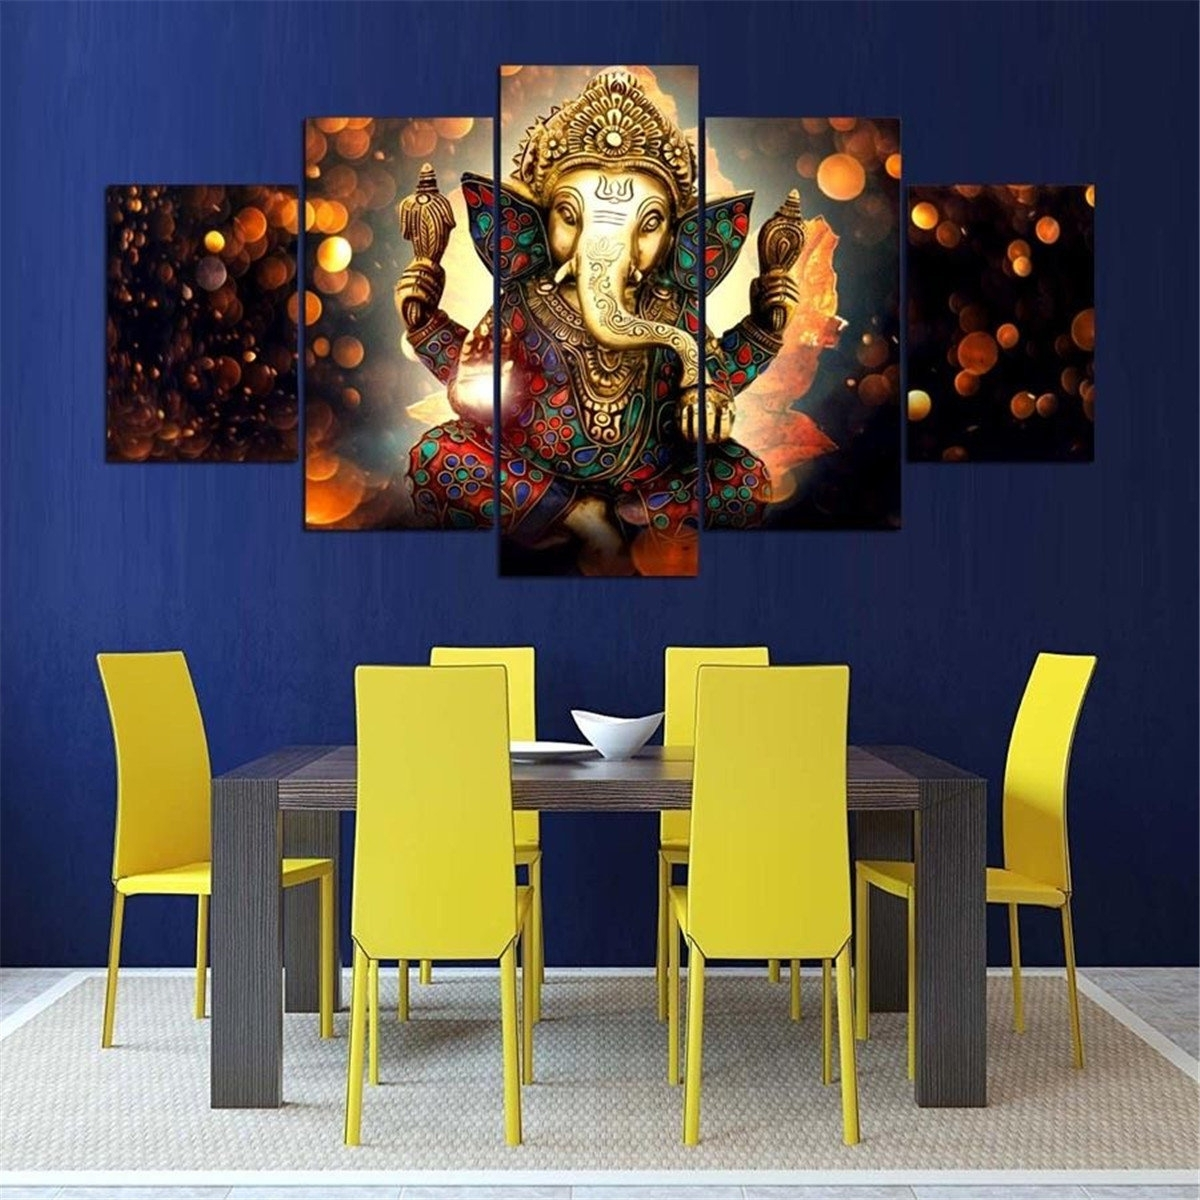 5Pcs Ganesha Painting Abstract Print Modern Canvas Wall Art Poster Regarding Latest Abstract Wall Art Posters (View 1 of 20)